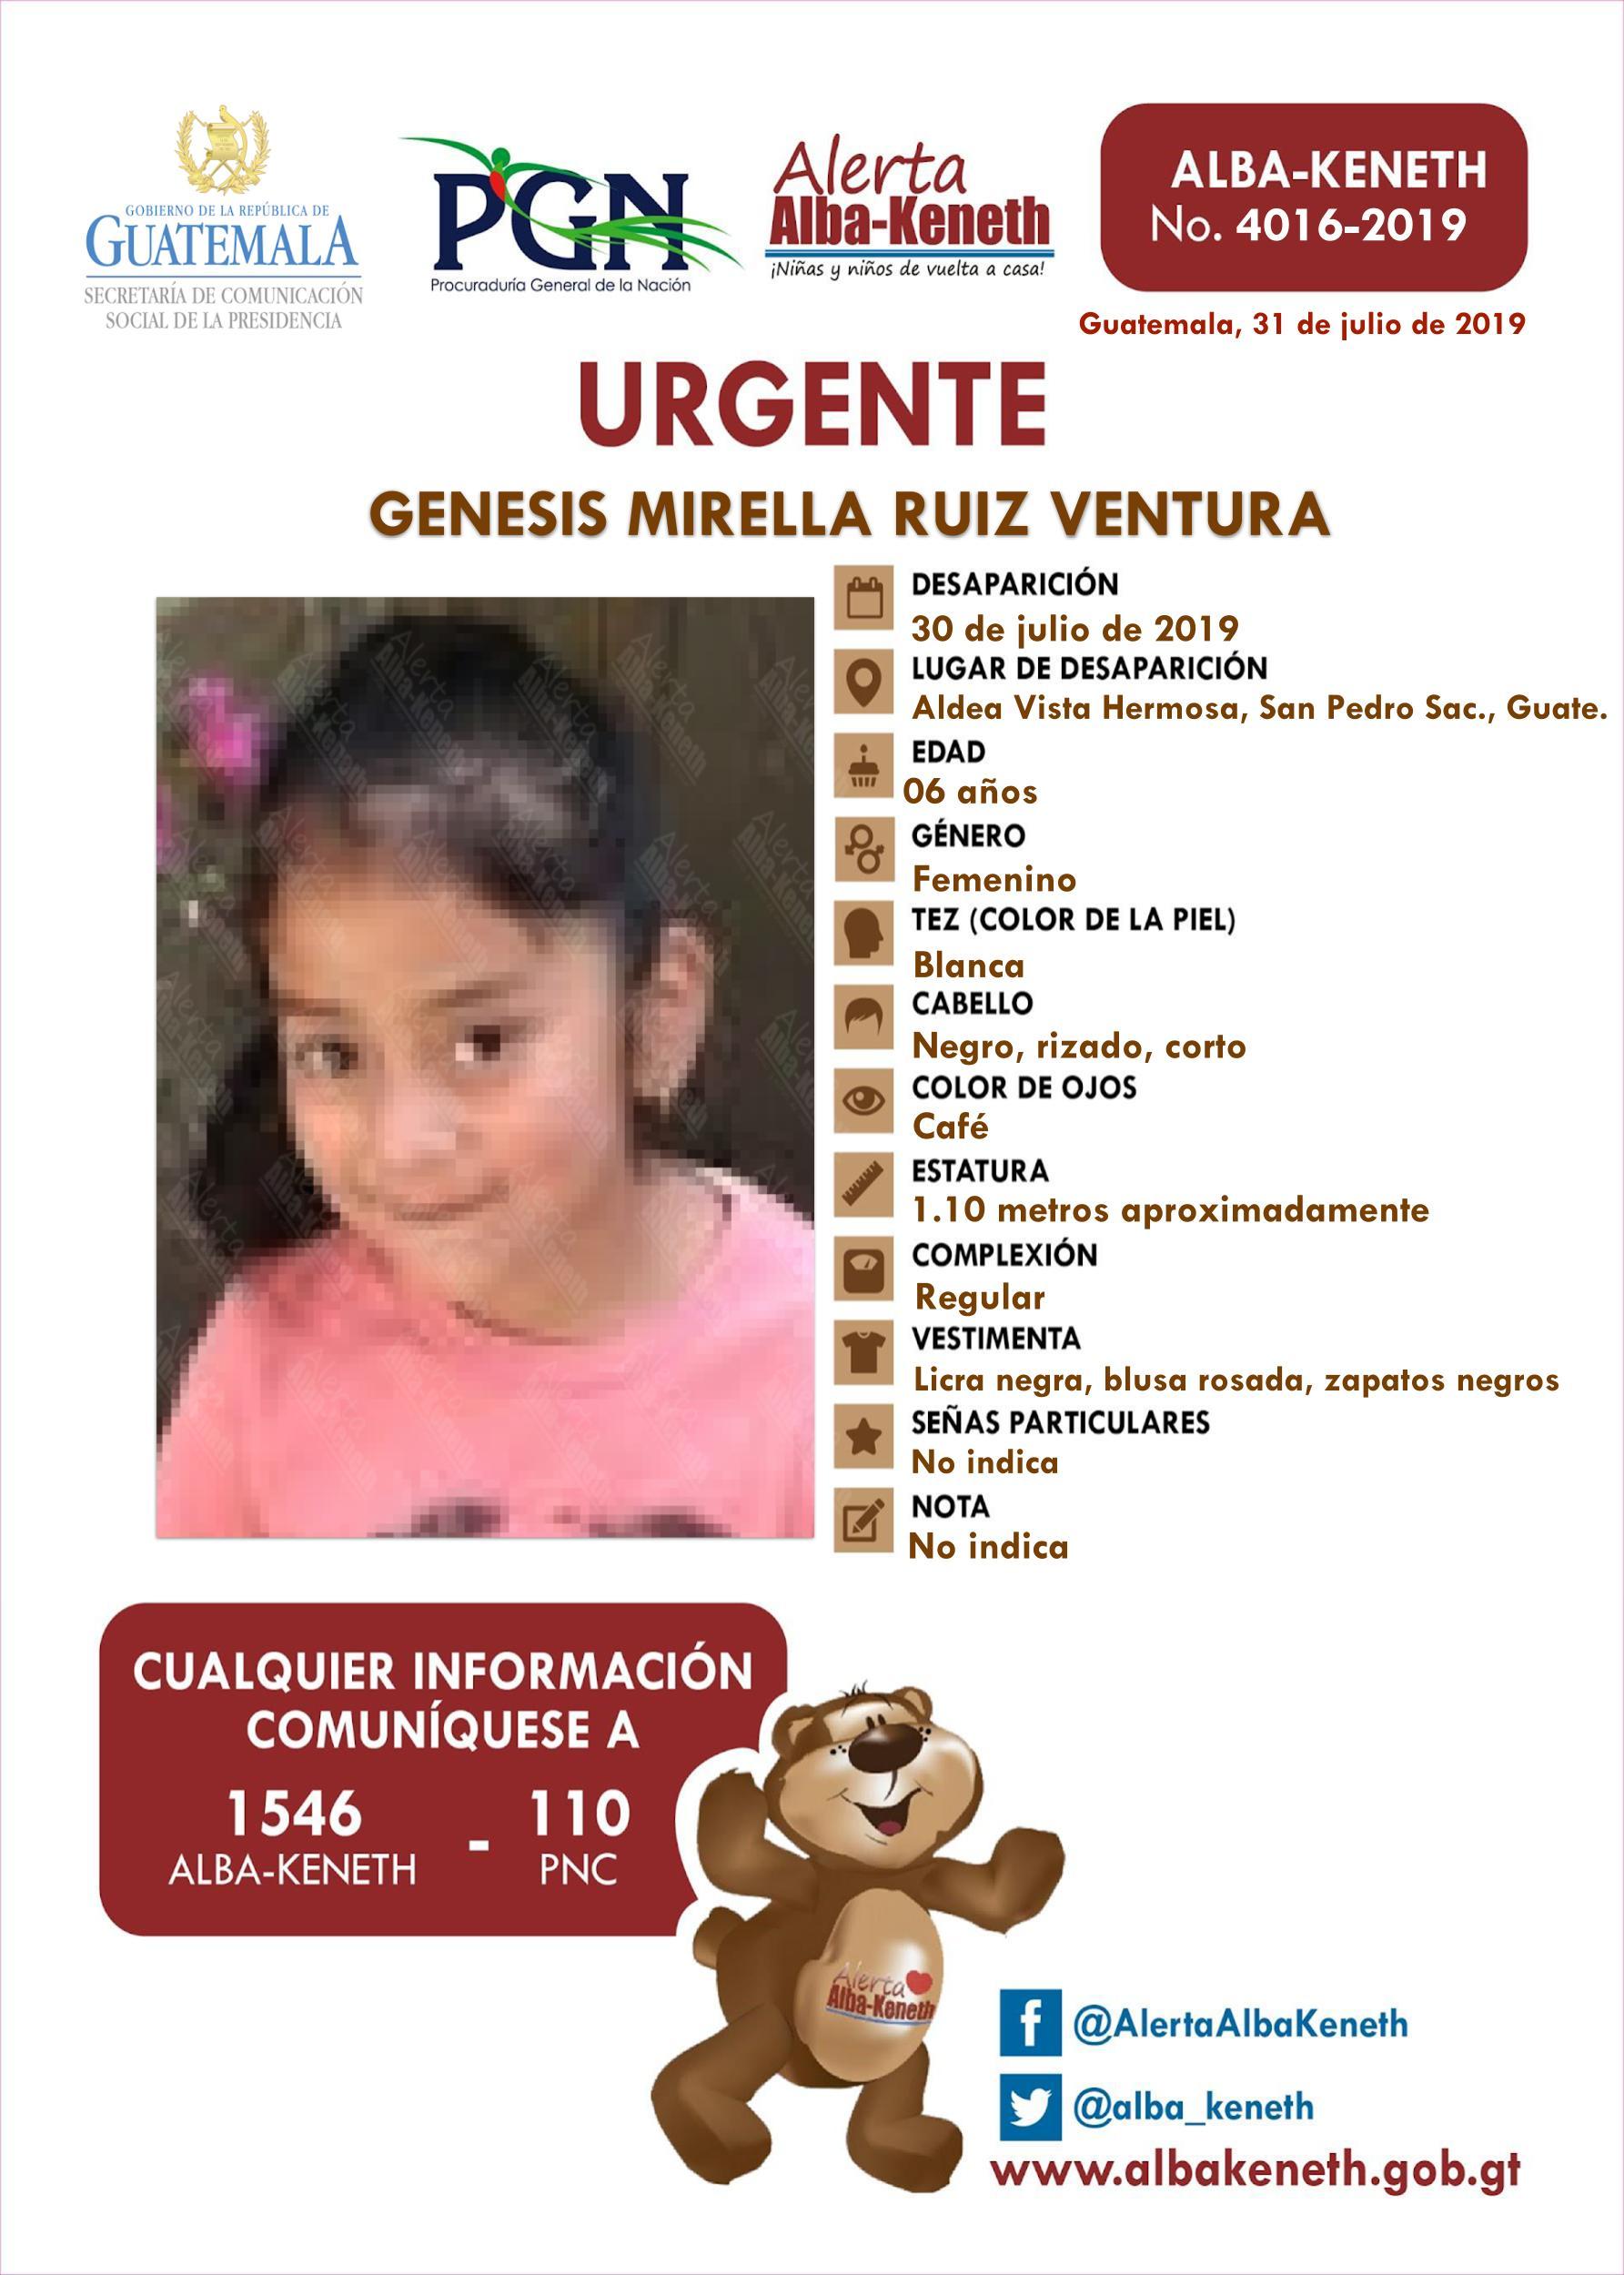 Genesis Mirella Ruiz Ventura